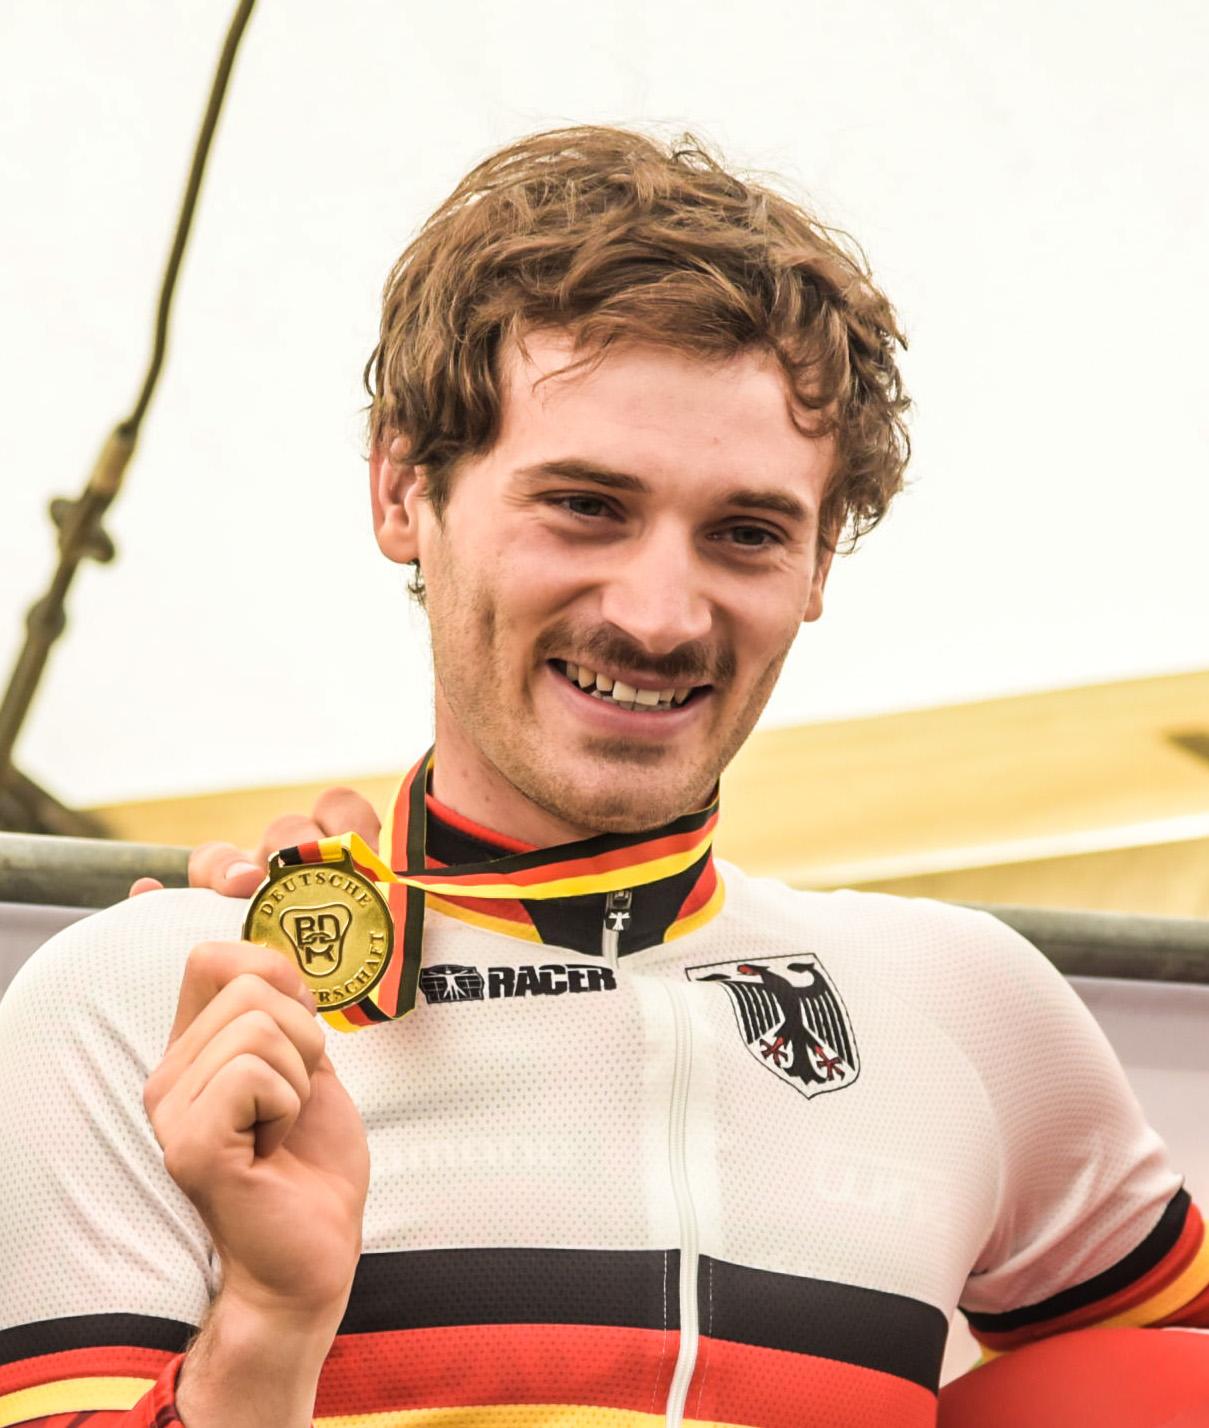 Markus Bauer_portrait_medaille_by sportograf